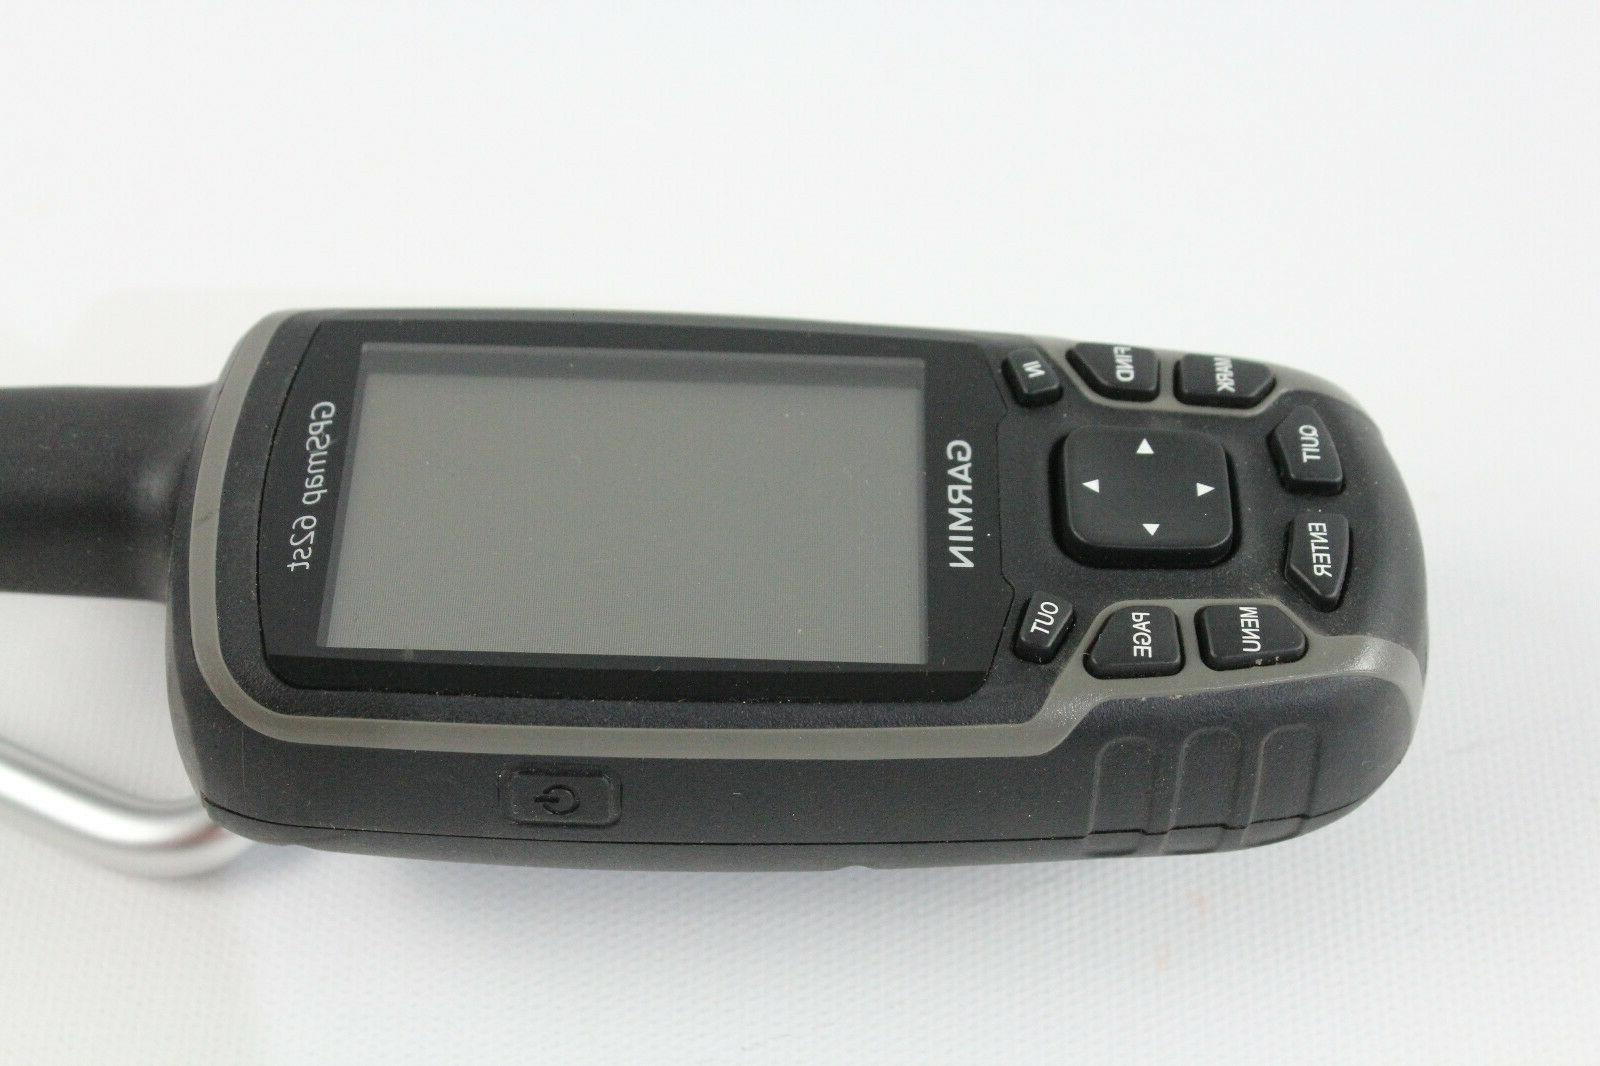 Garmin GPS Tested Working